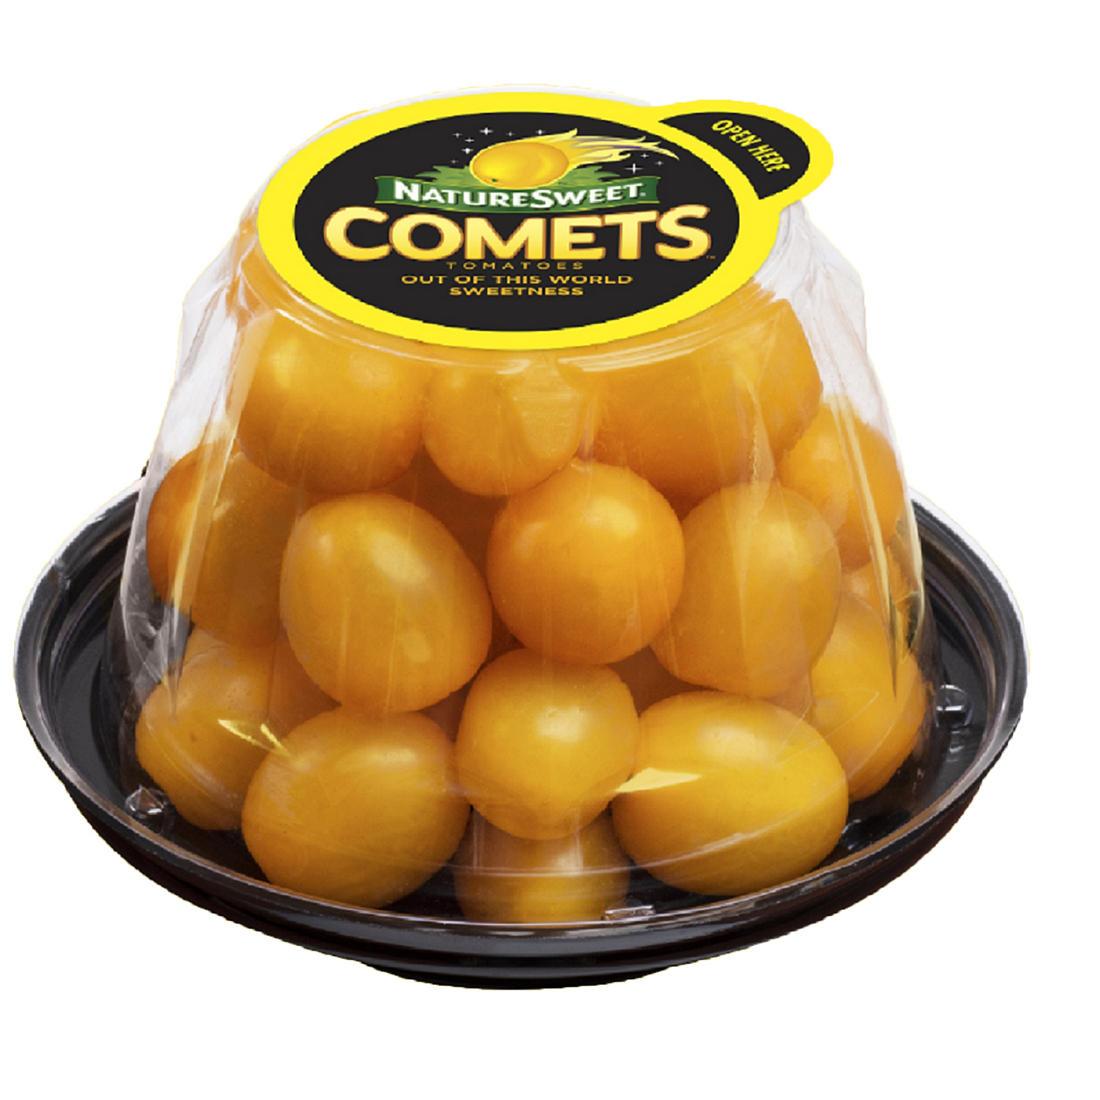 Nature Sweet Comet Tomatoes, 18 oz.